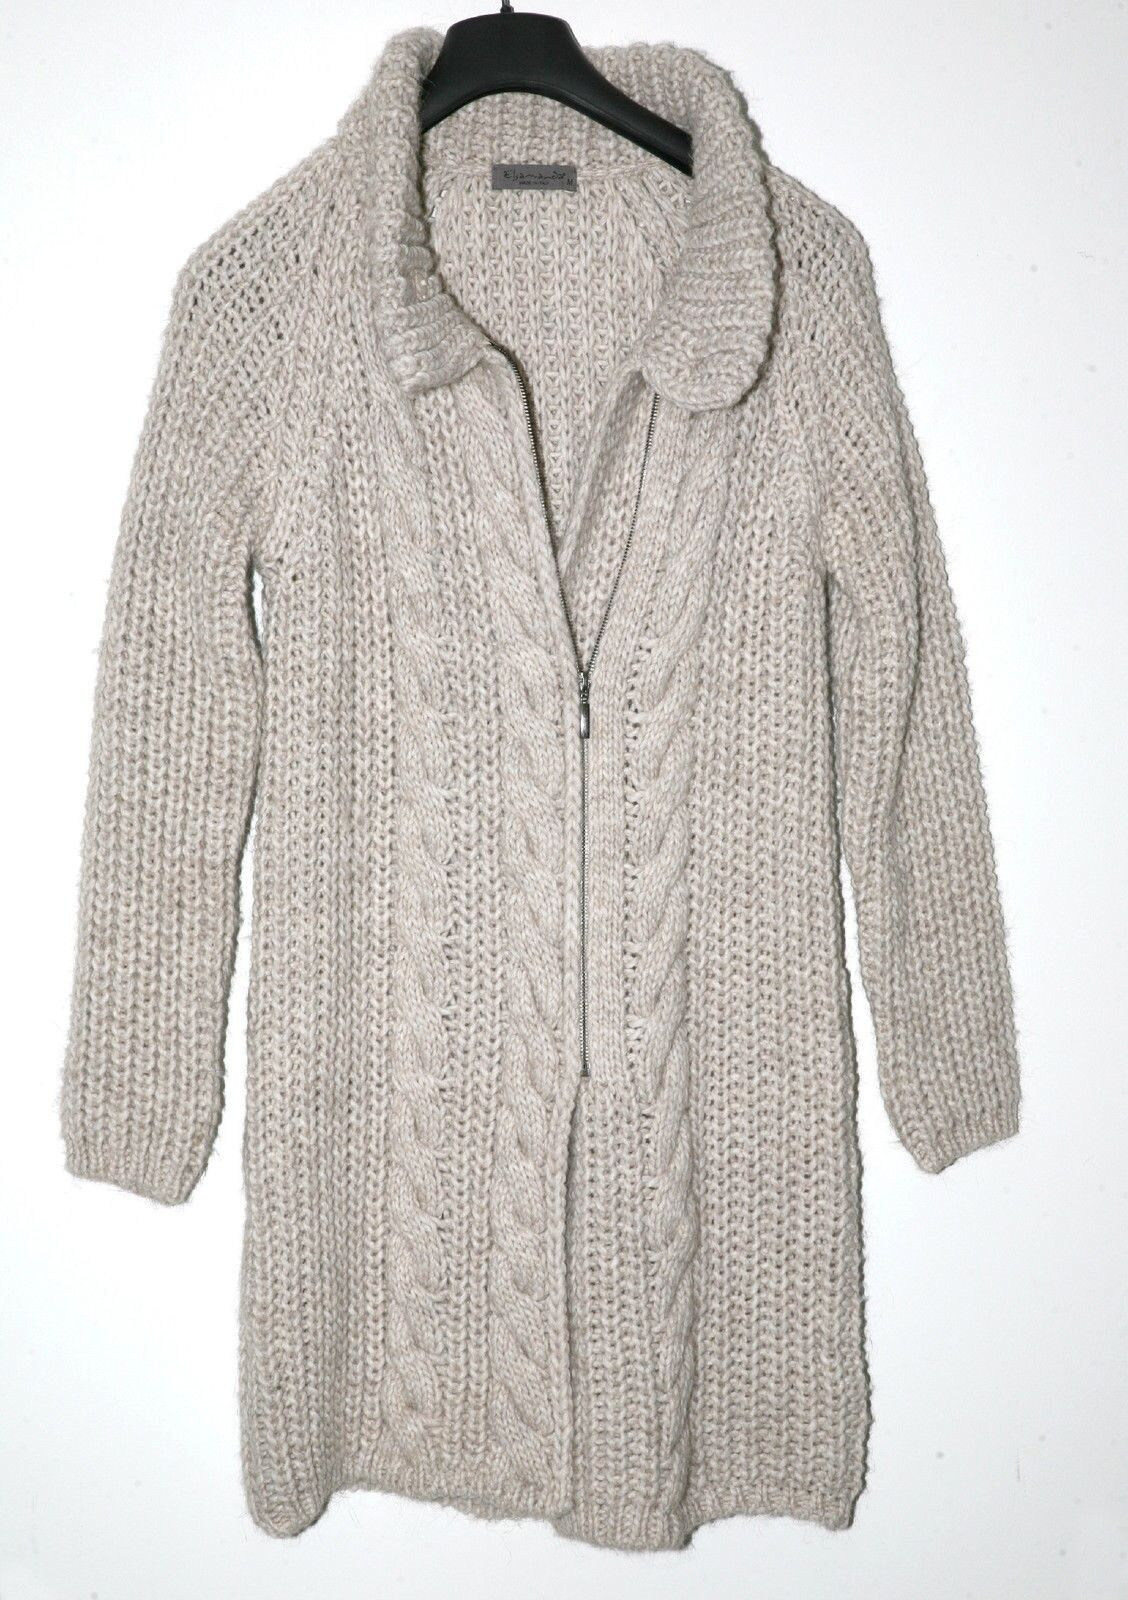 9410b7dcc57 ELSAMANDA WOMENS CARDIGAN SWEATER. SIZE M.. OATMEAL COLOR. FRONT ZIP  npwjgt1443-Sweaters